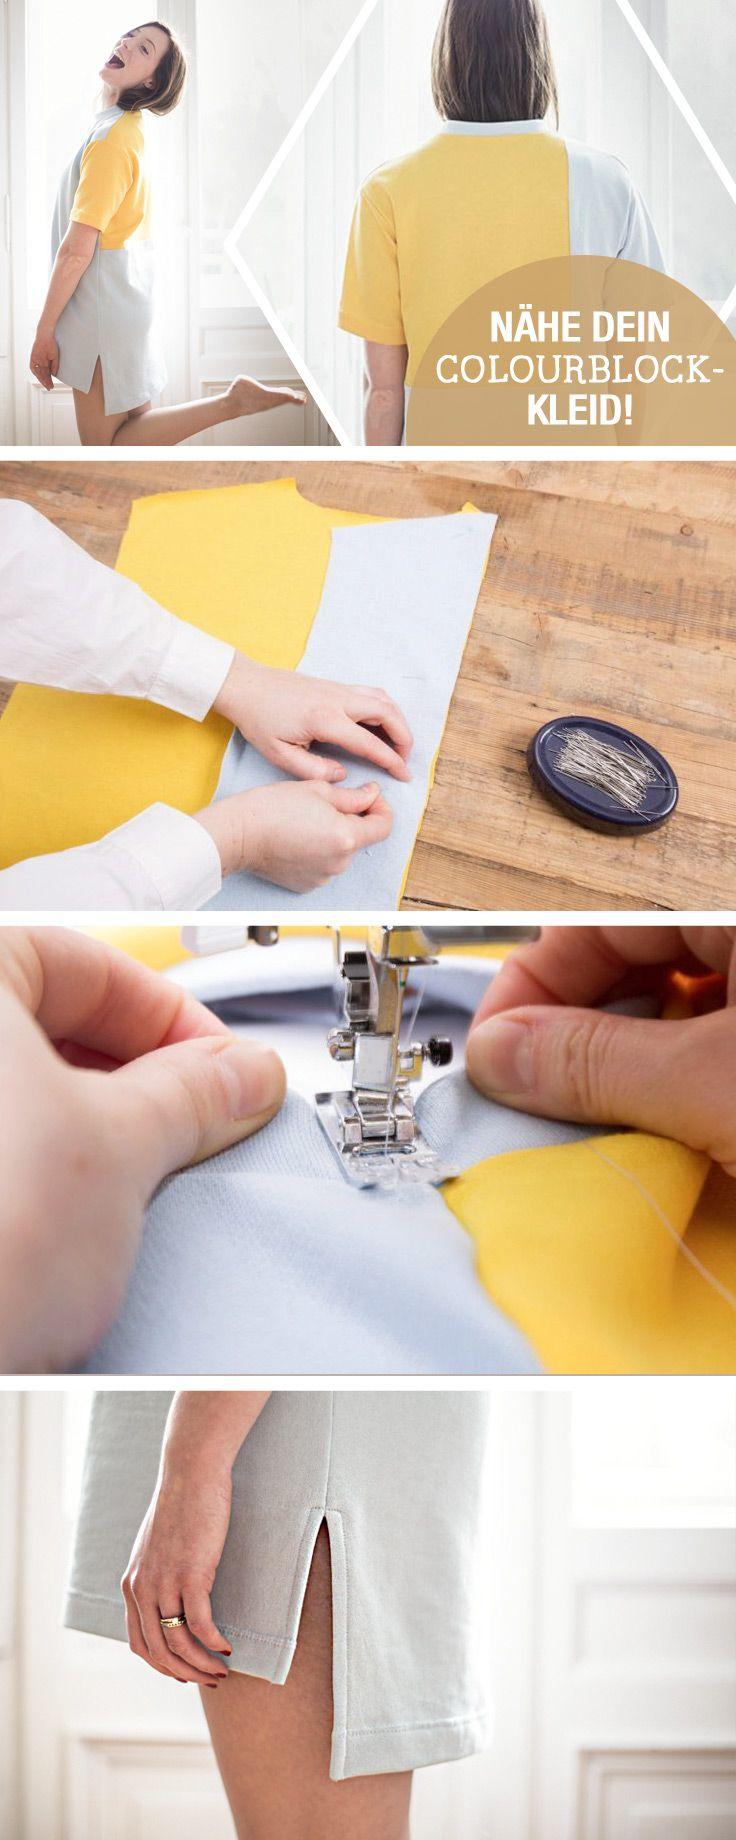 Nähanleitung: Colourblocking-Kleid nach Schnittmuster in den Größen 34 bis 46 nähen / diy sewing tutorial: colorblocking-dress via DaWanda.com